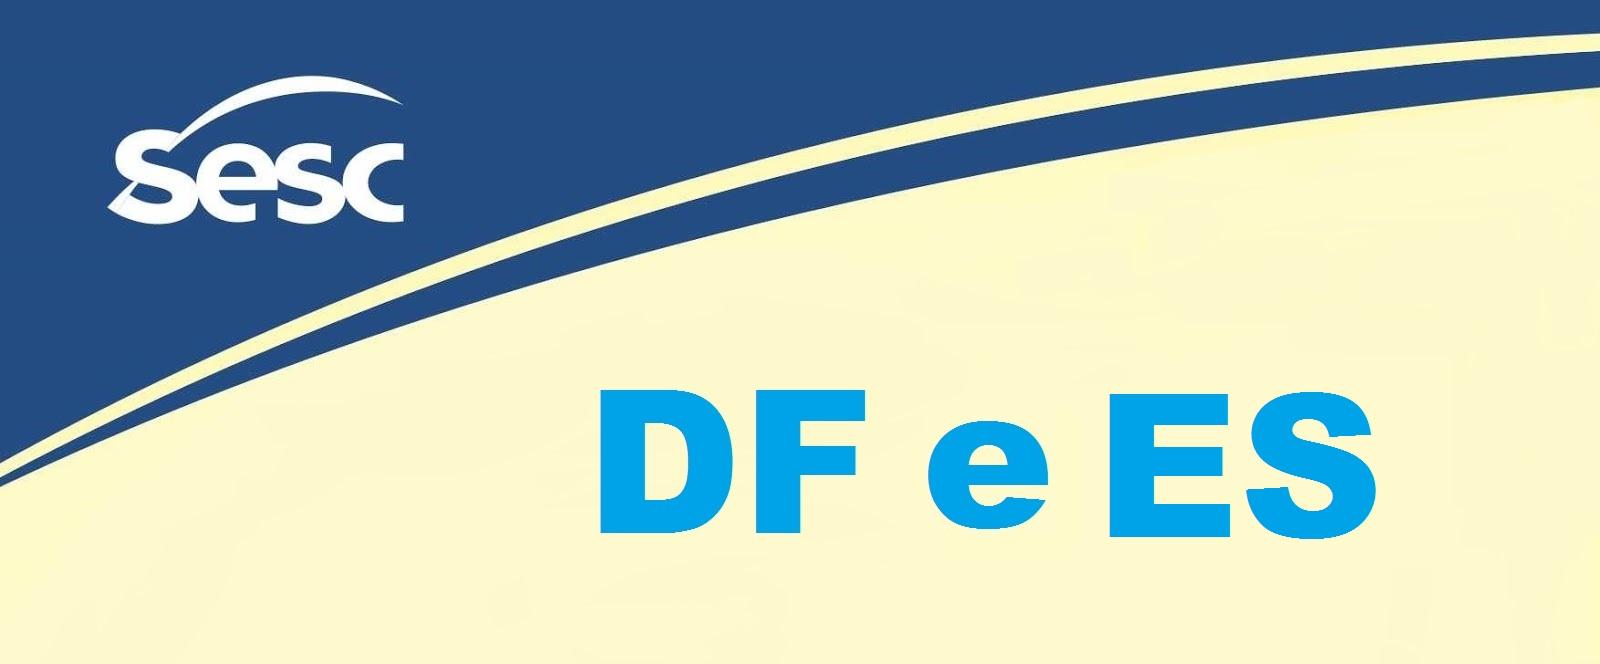 Associados de todo o país têm descontos no Sesc DF e Espírito Santo